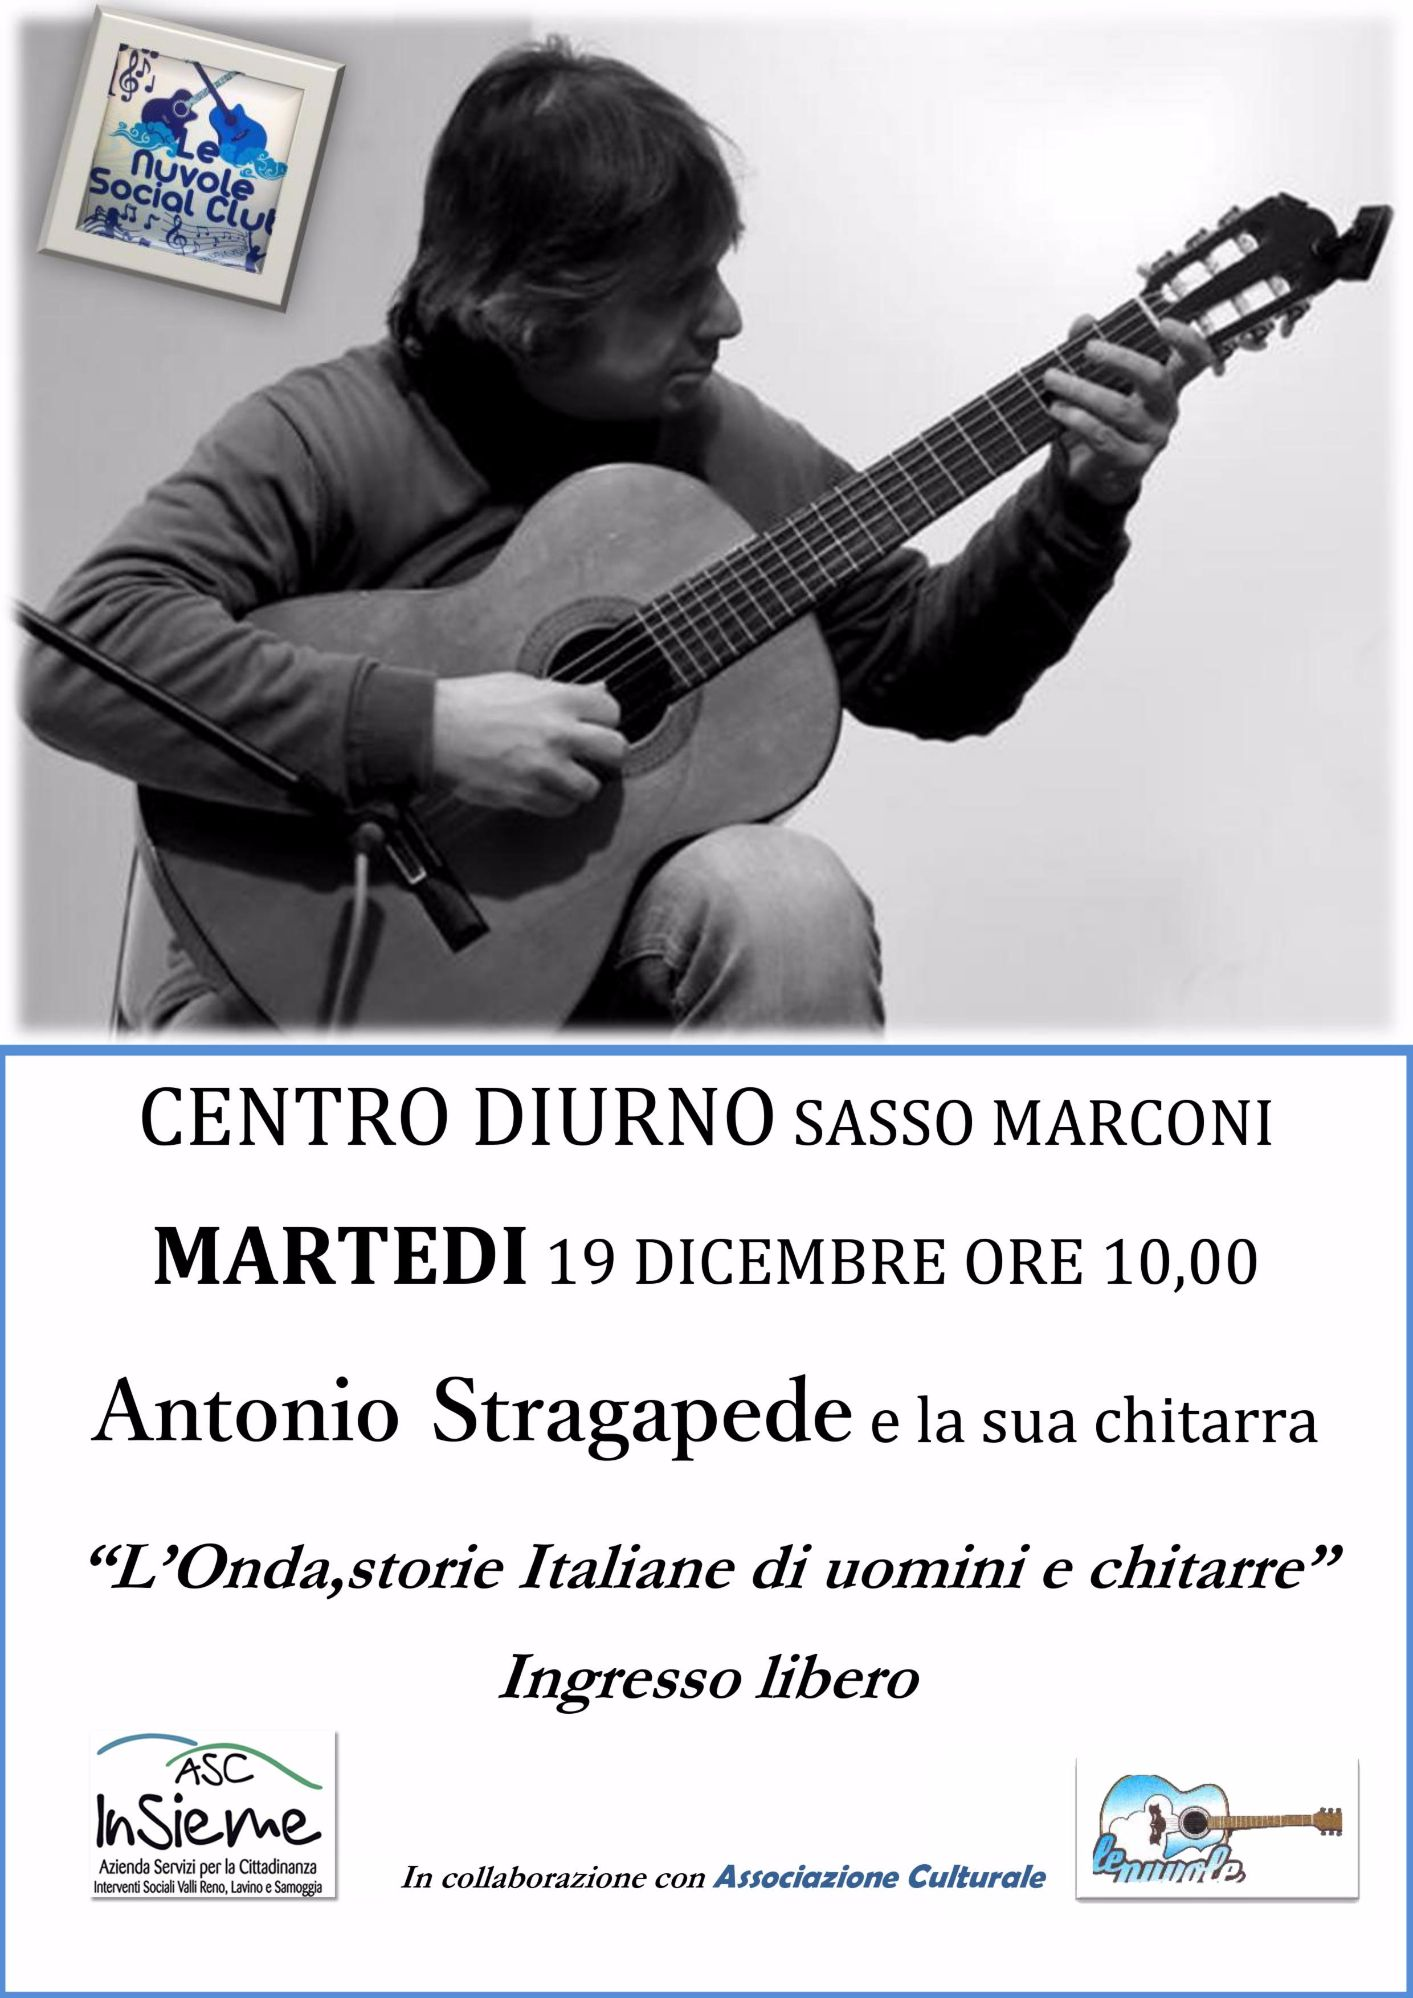 Antonio Stragapede e la sua chitarra